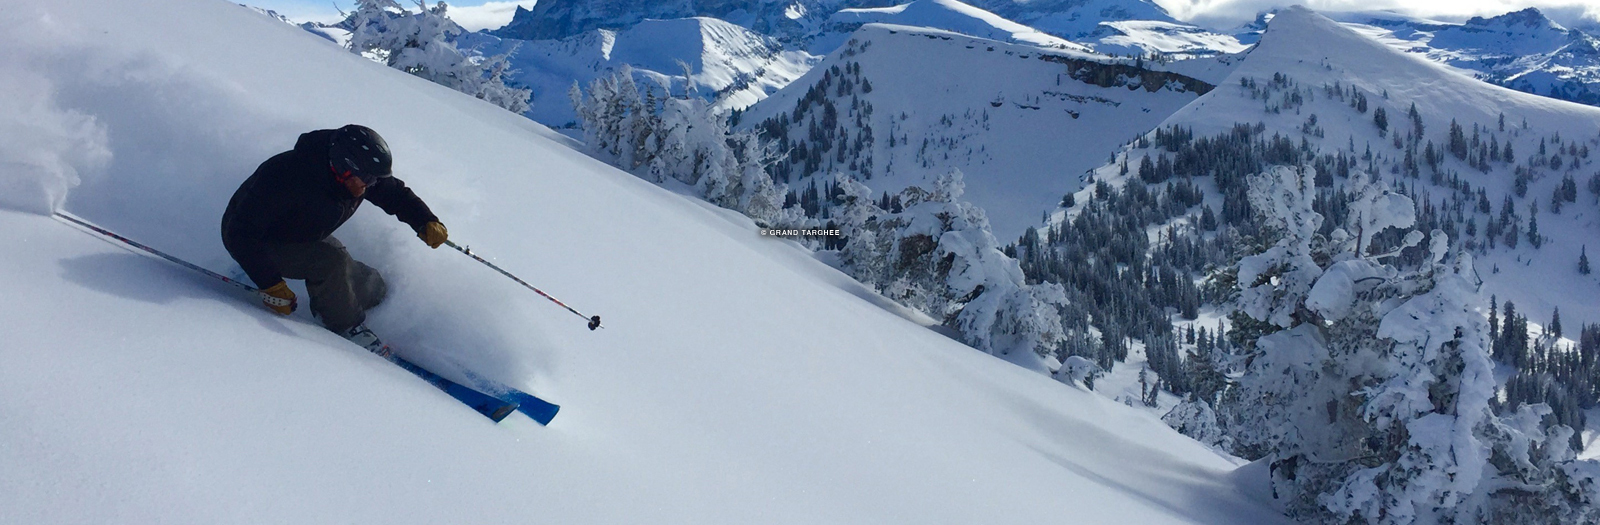 Grand Targhee Ski Resort, grand targhee wyoming, skiing in the tetons